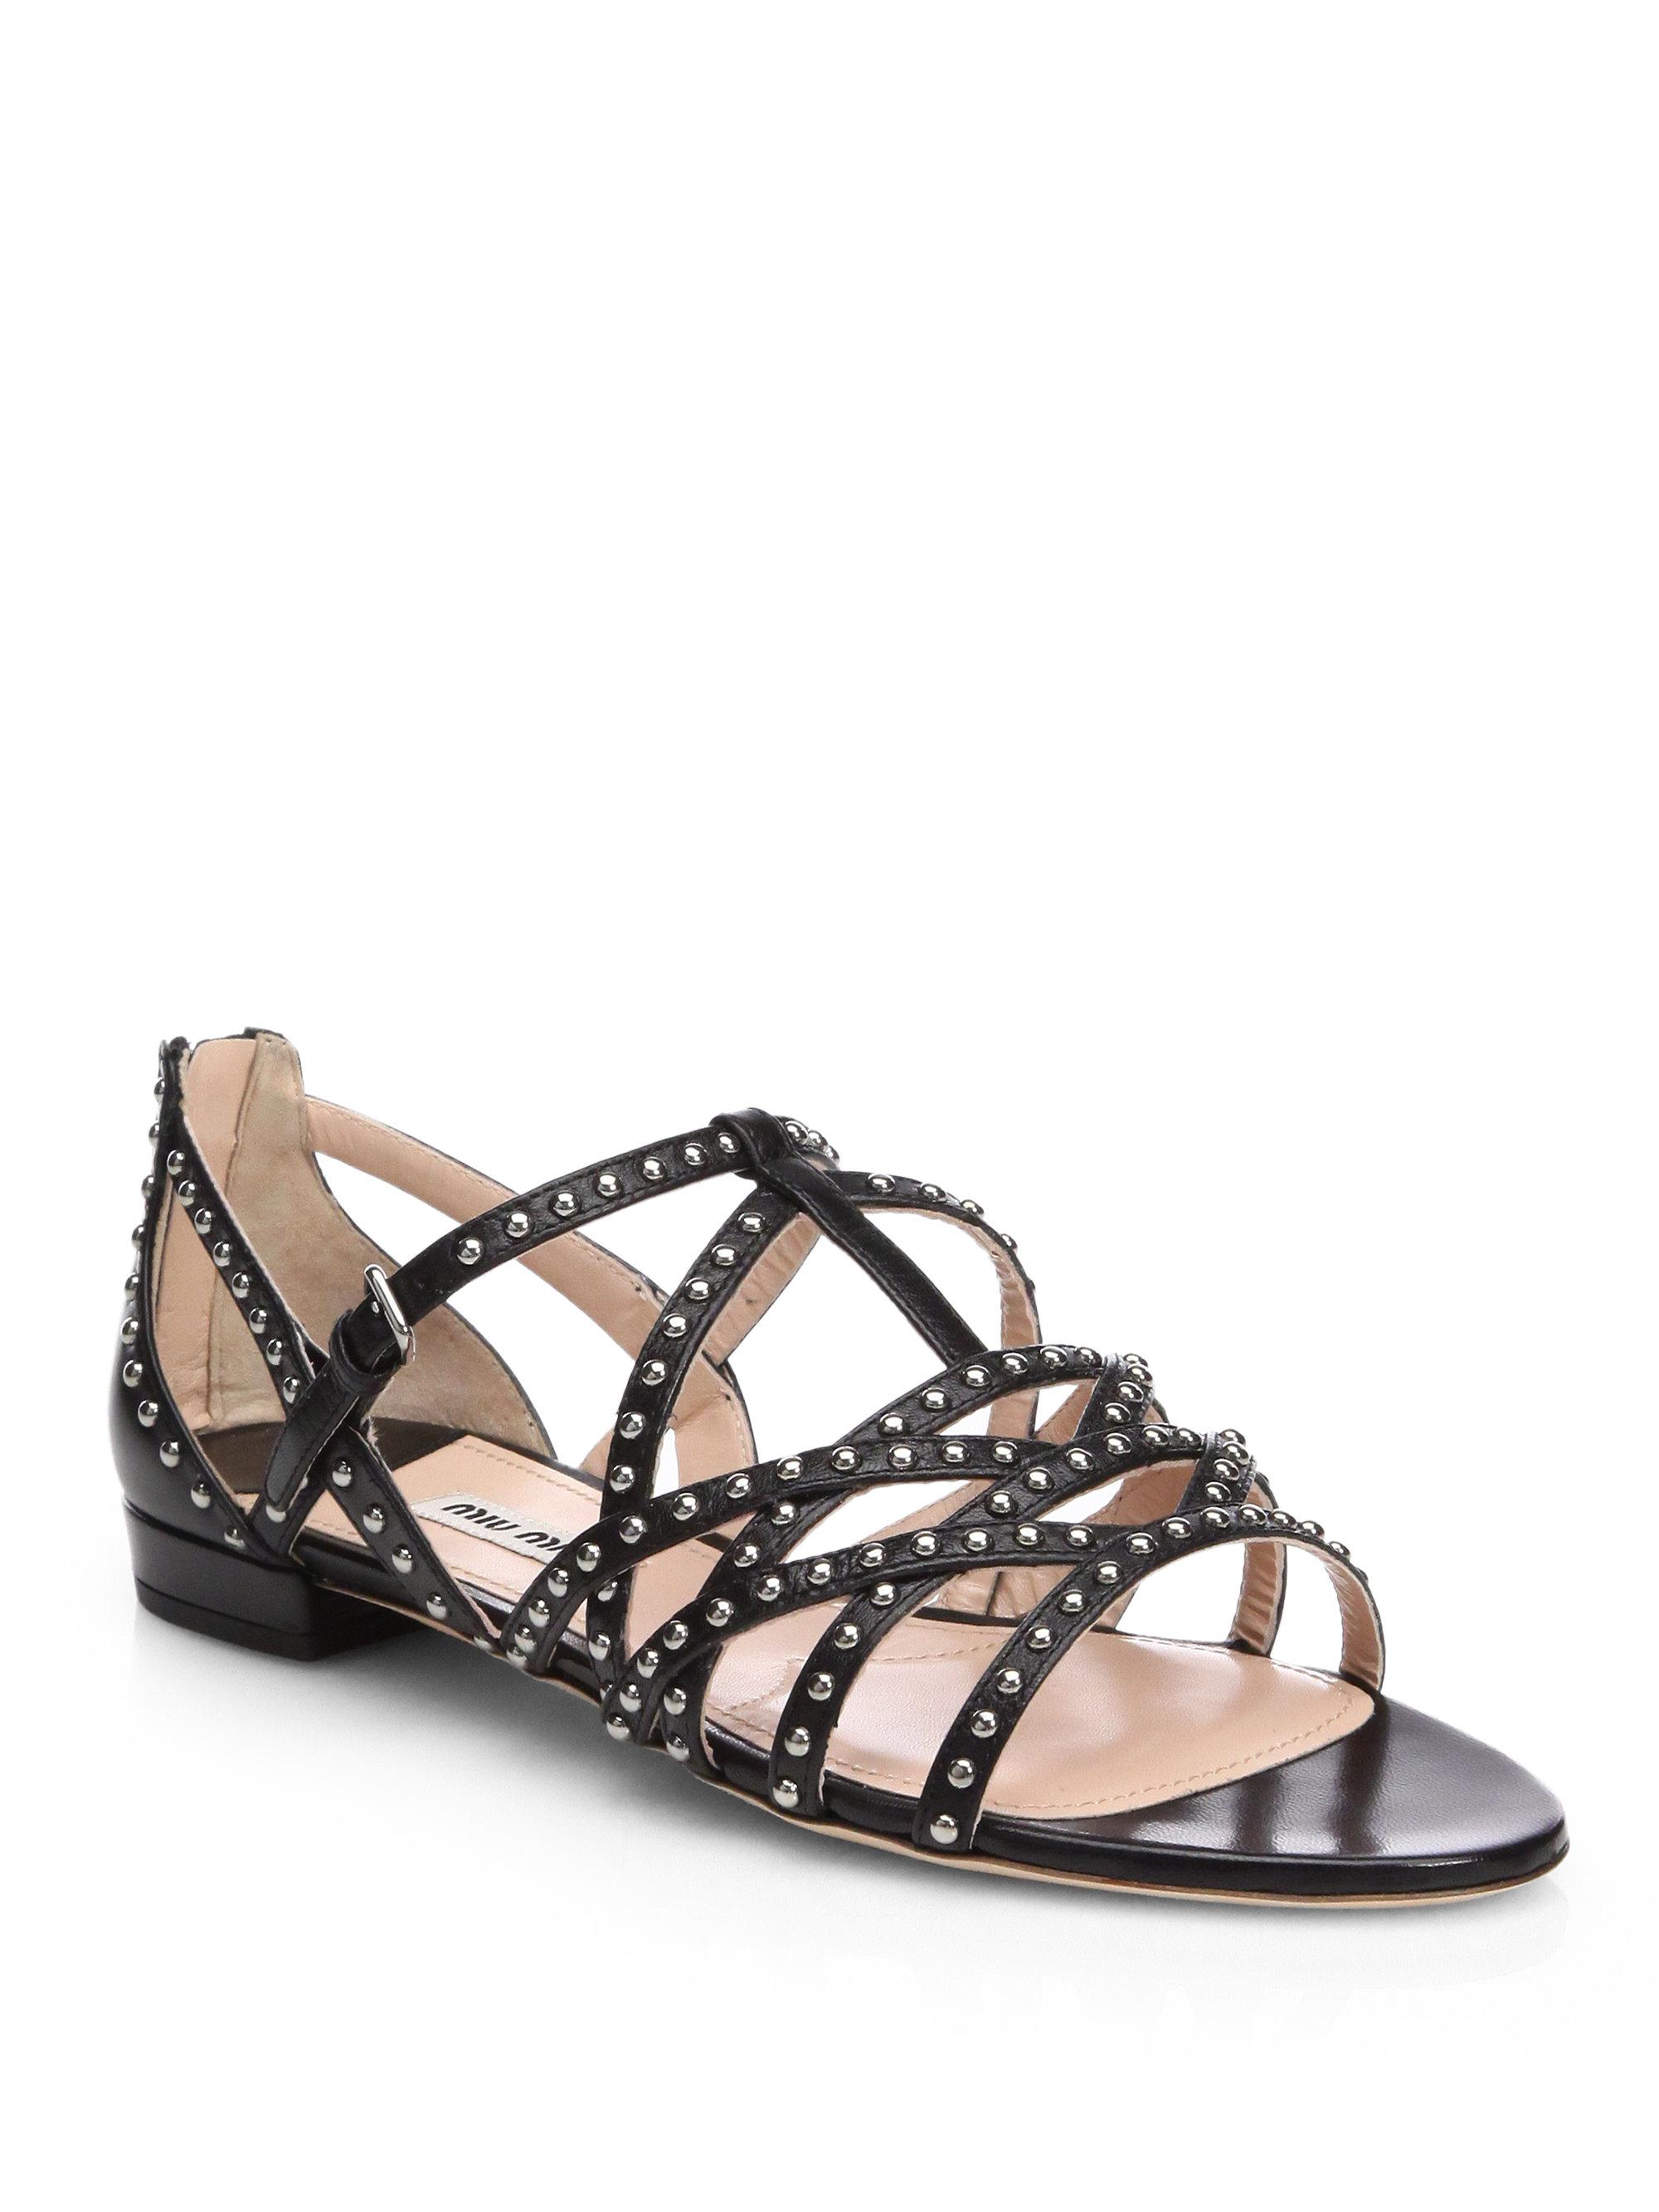 Miu Miu Flat strappy sandals Quality For Sale Free Shipping Free Shipping Genuine Free Shipping Clearance aHrrW